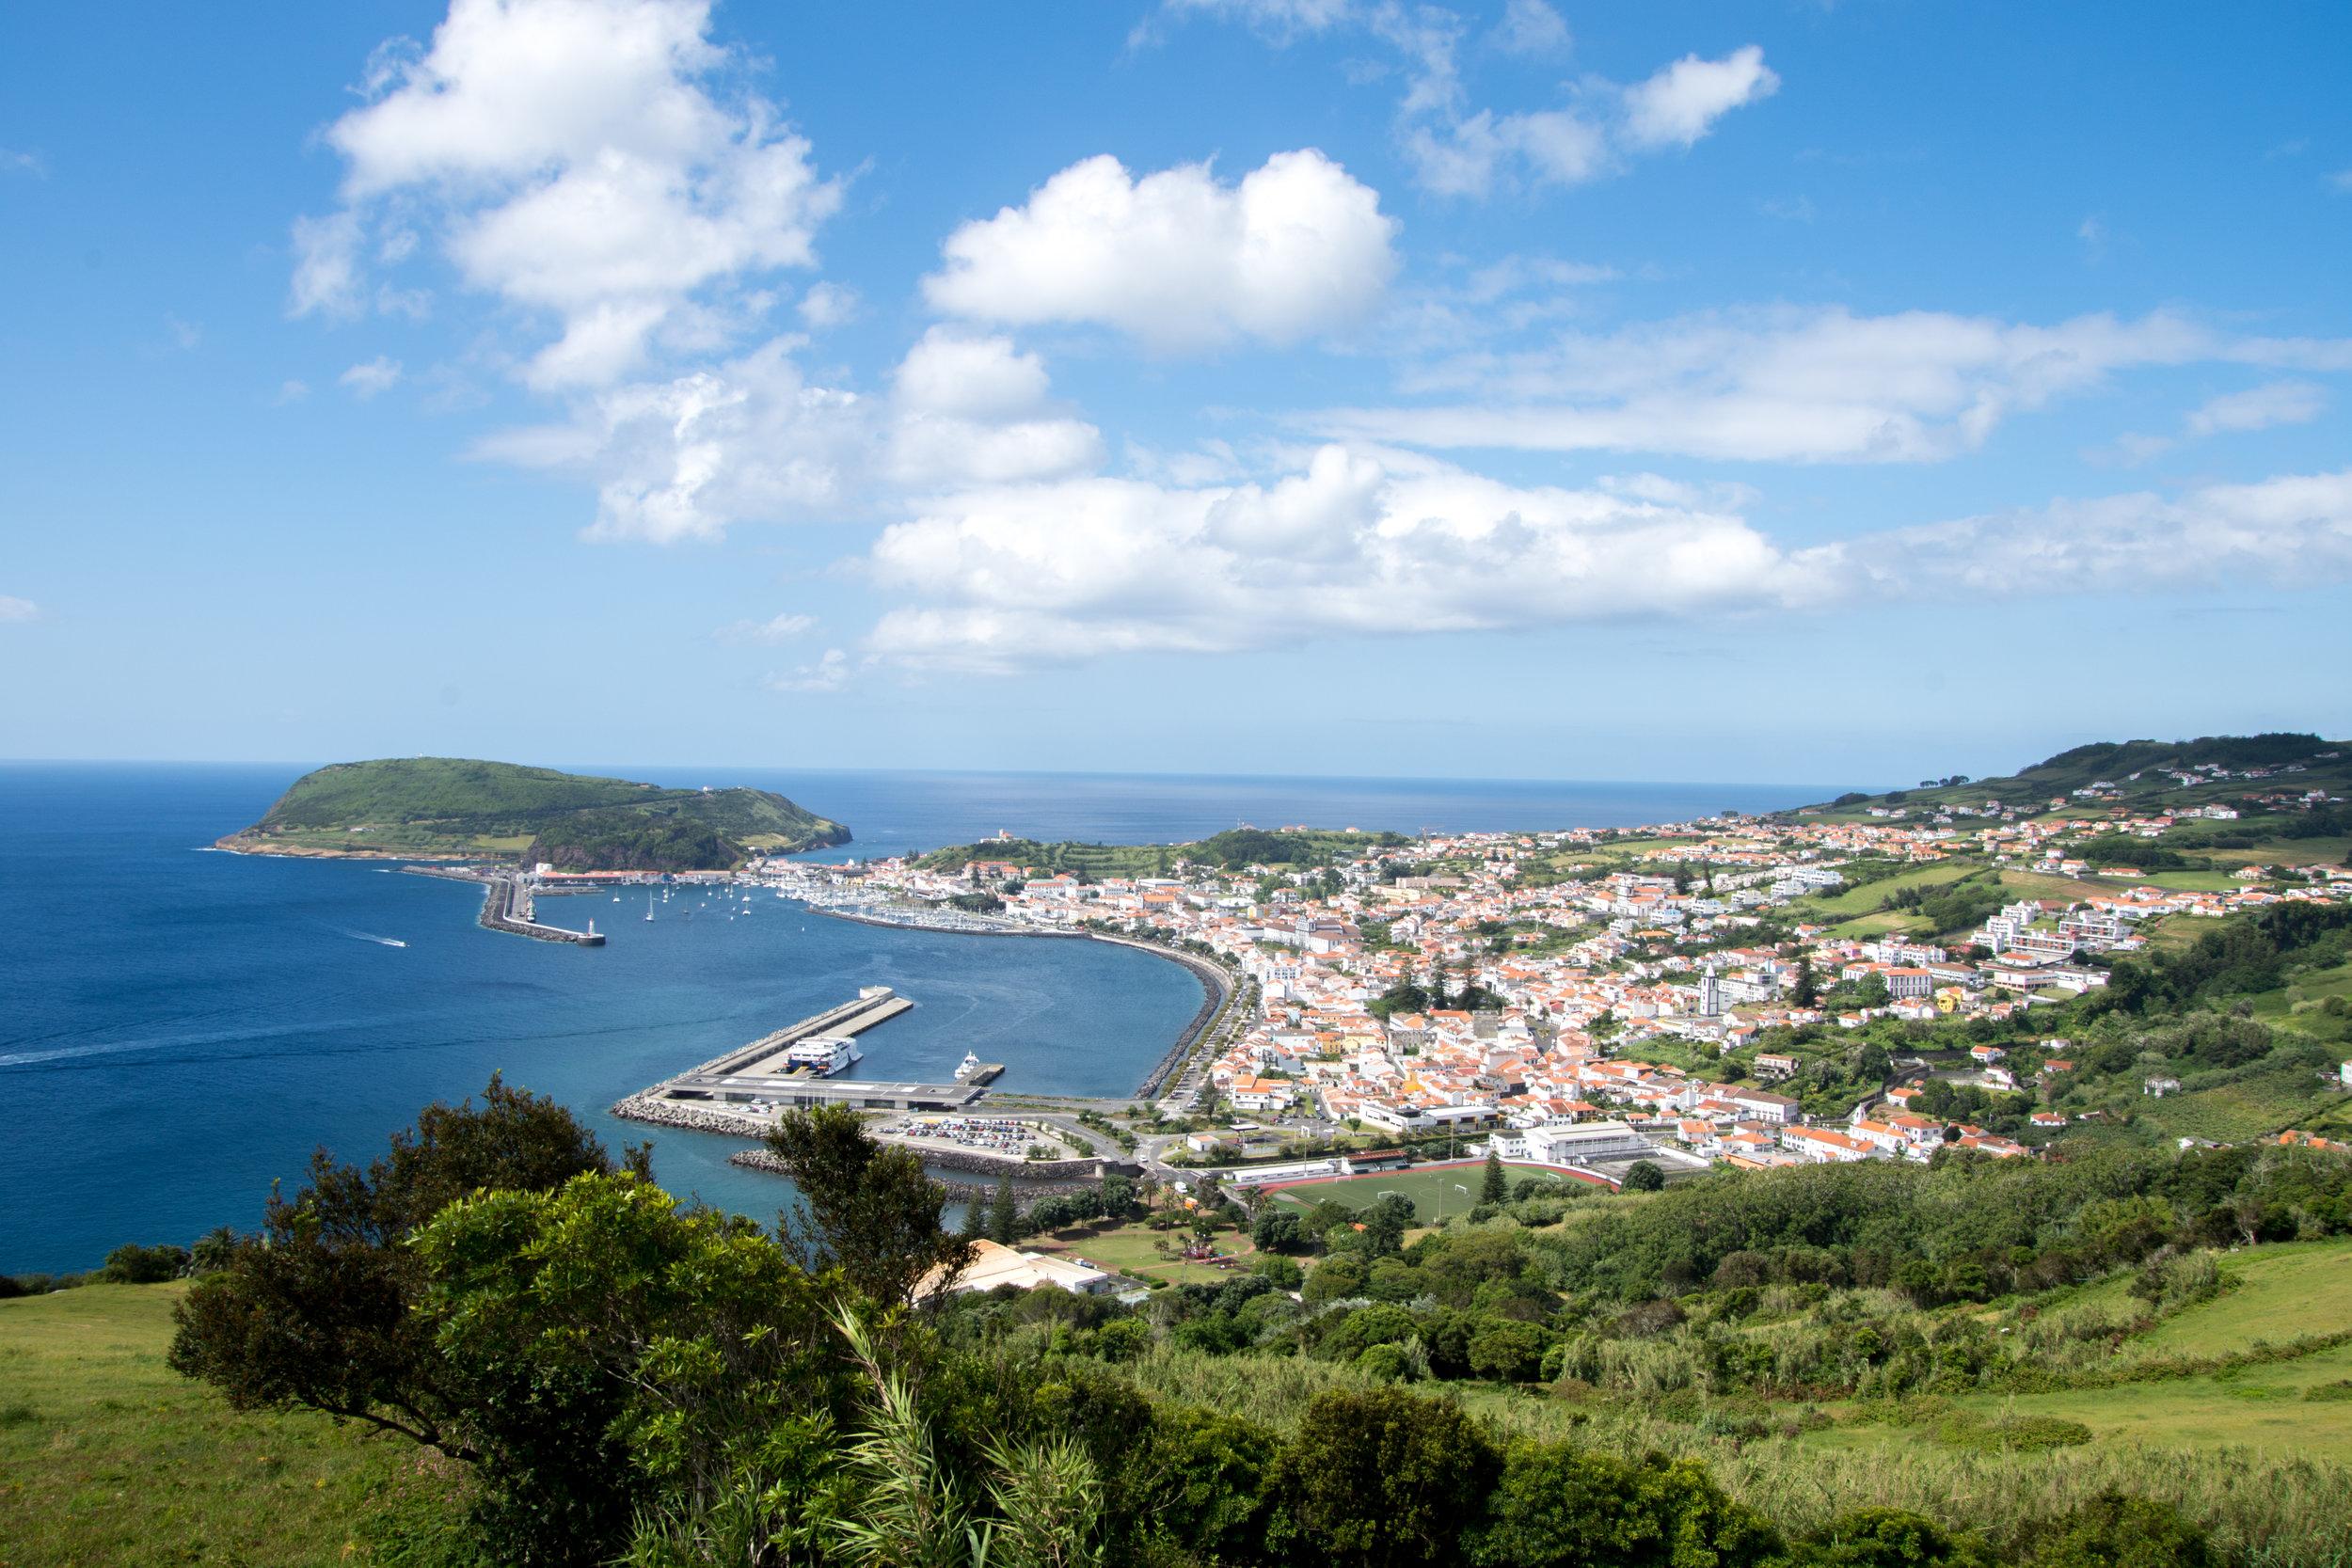 View of Horta